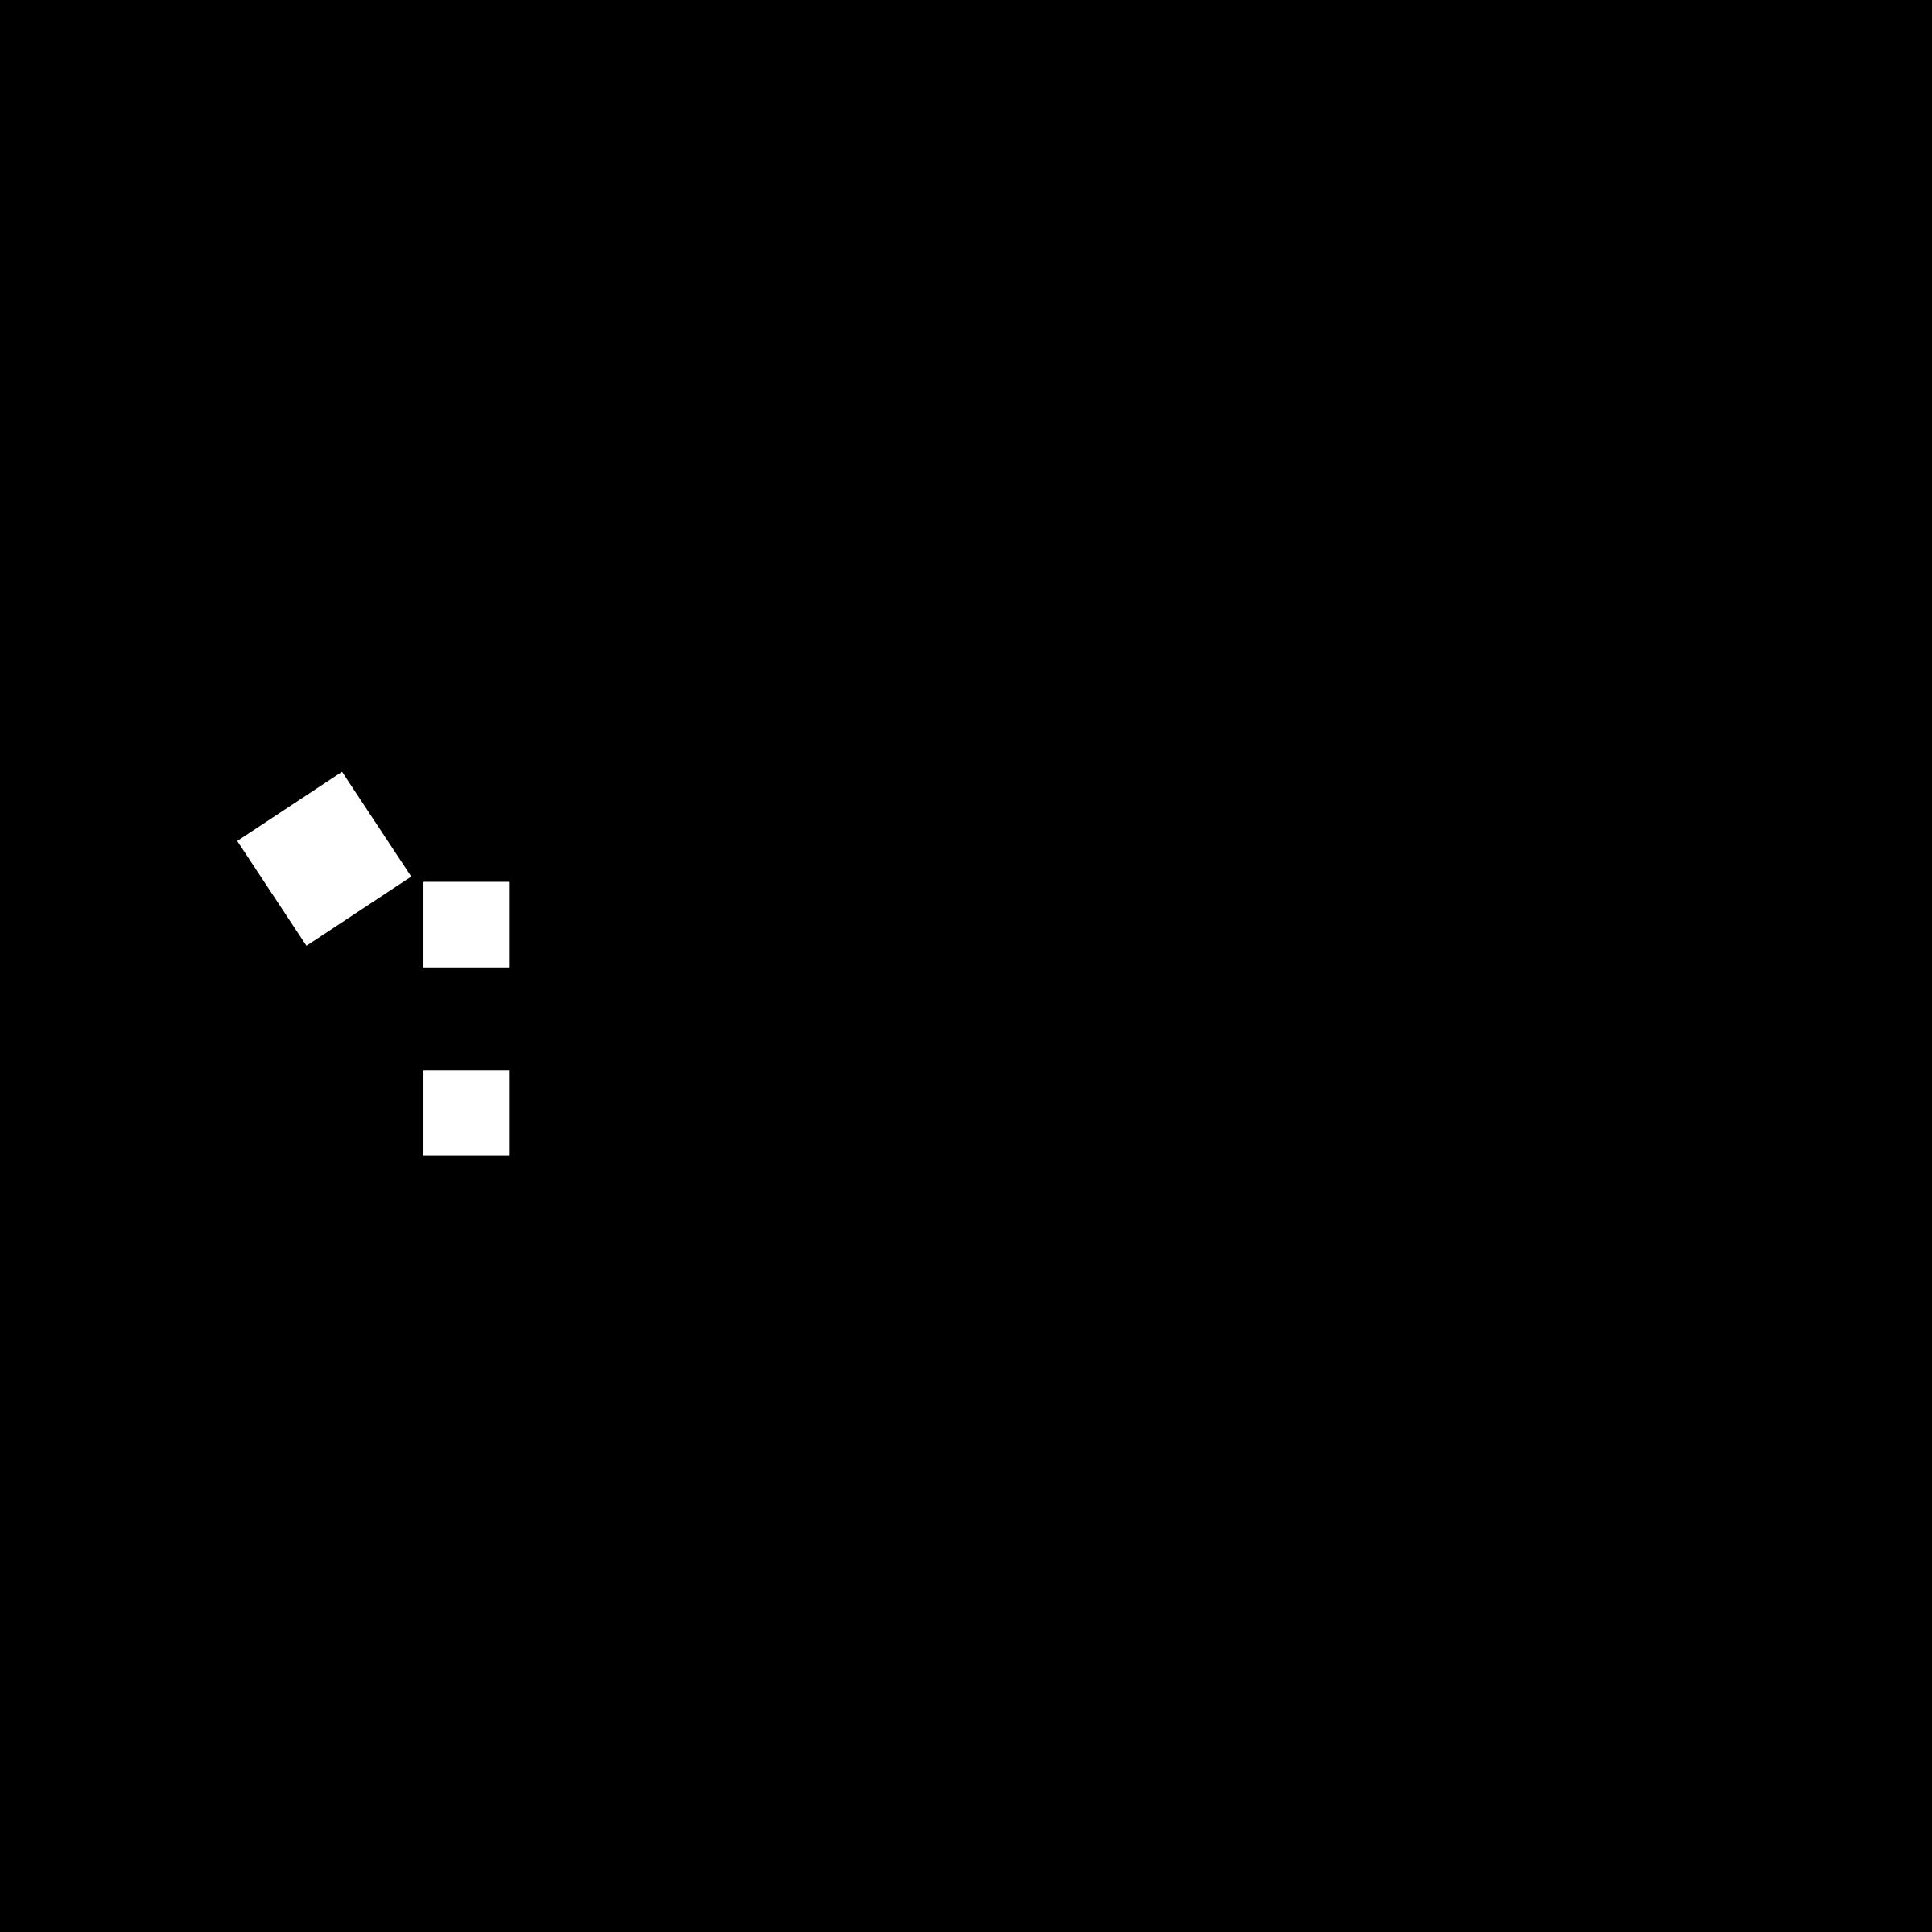 Meliconi Logo PNG Transparent